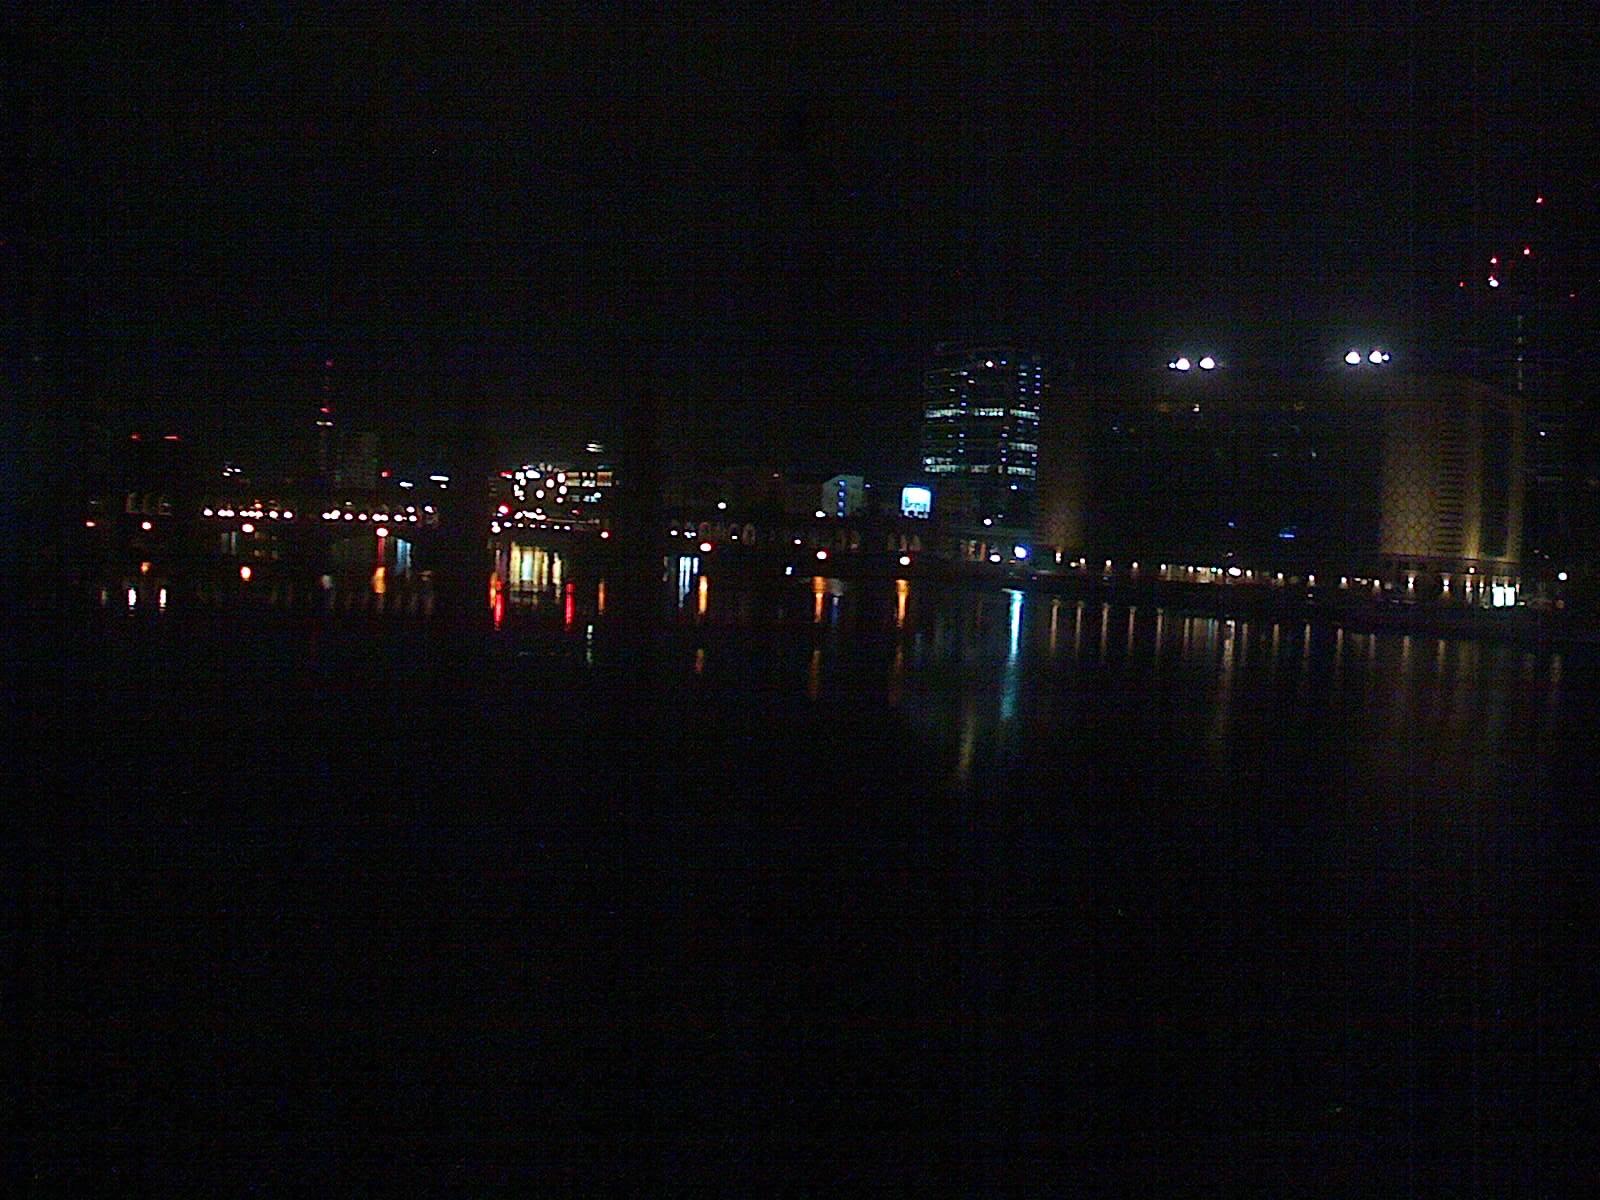 Берлин времето уеб камера мост с кули 'Обербаум' на река Шпрее, улица 'Варшавска' трафик, булевард столица Германия Free-WebCamBG